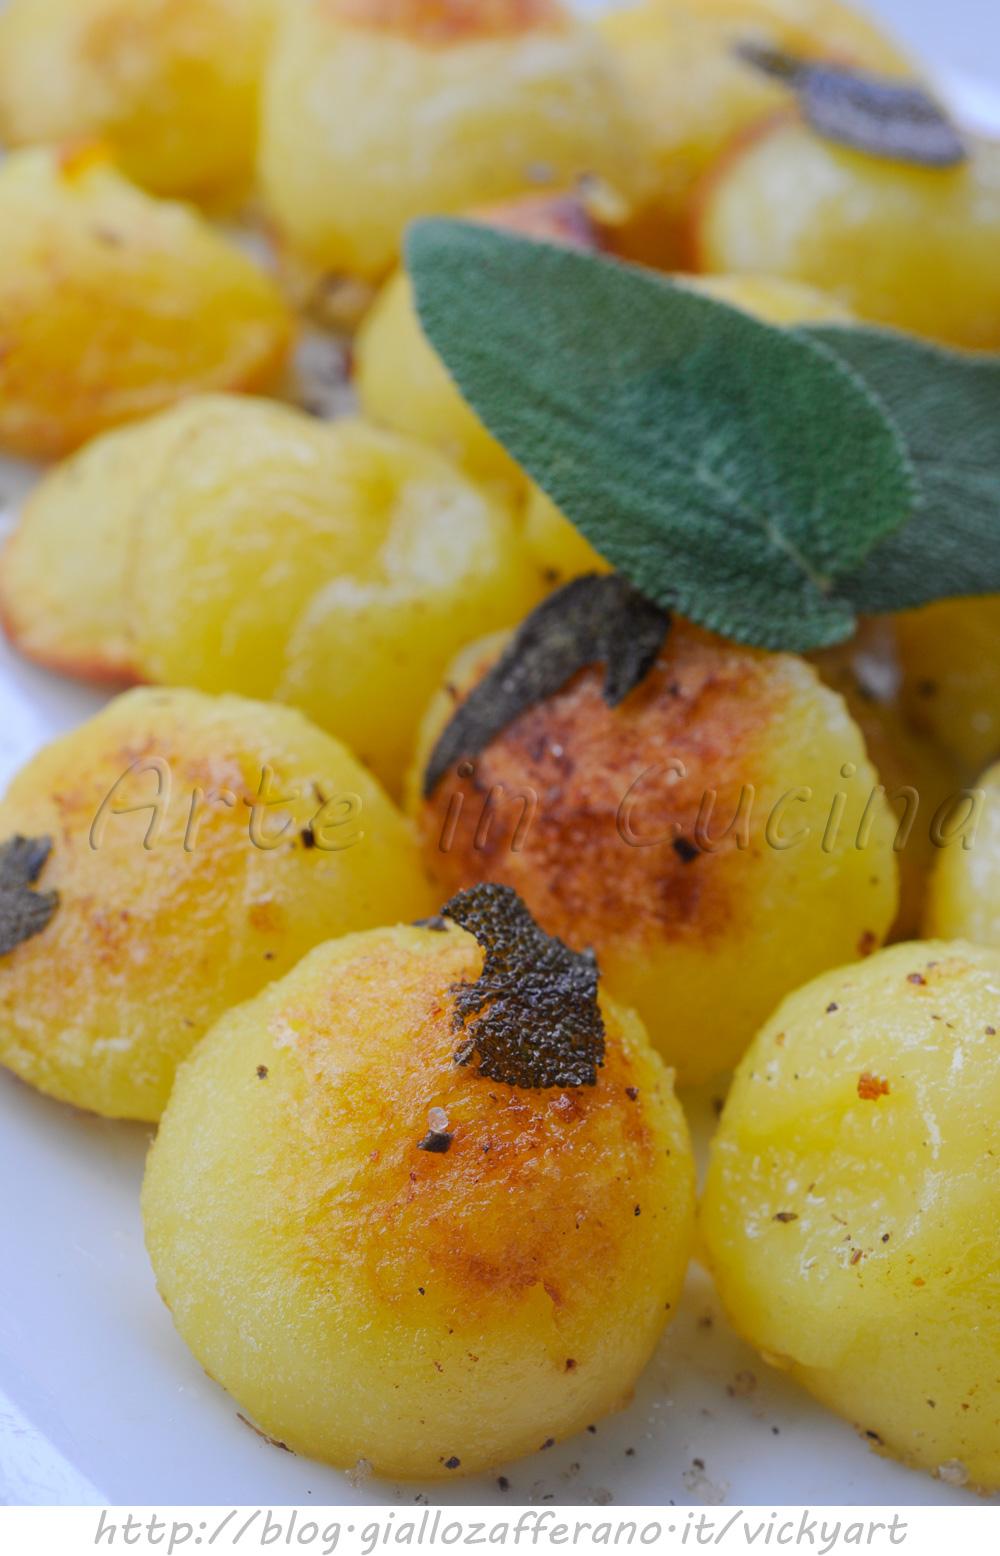 Patate alla parigina ricetta facile pomme parisienne vickyart arte in cucina